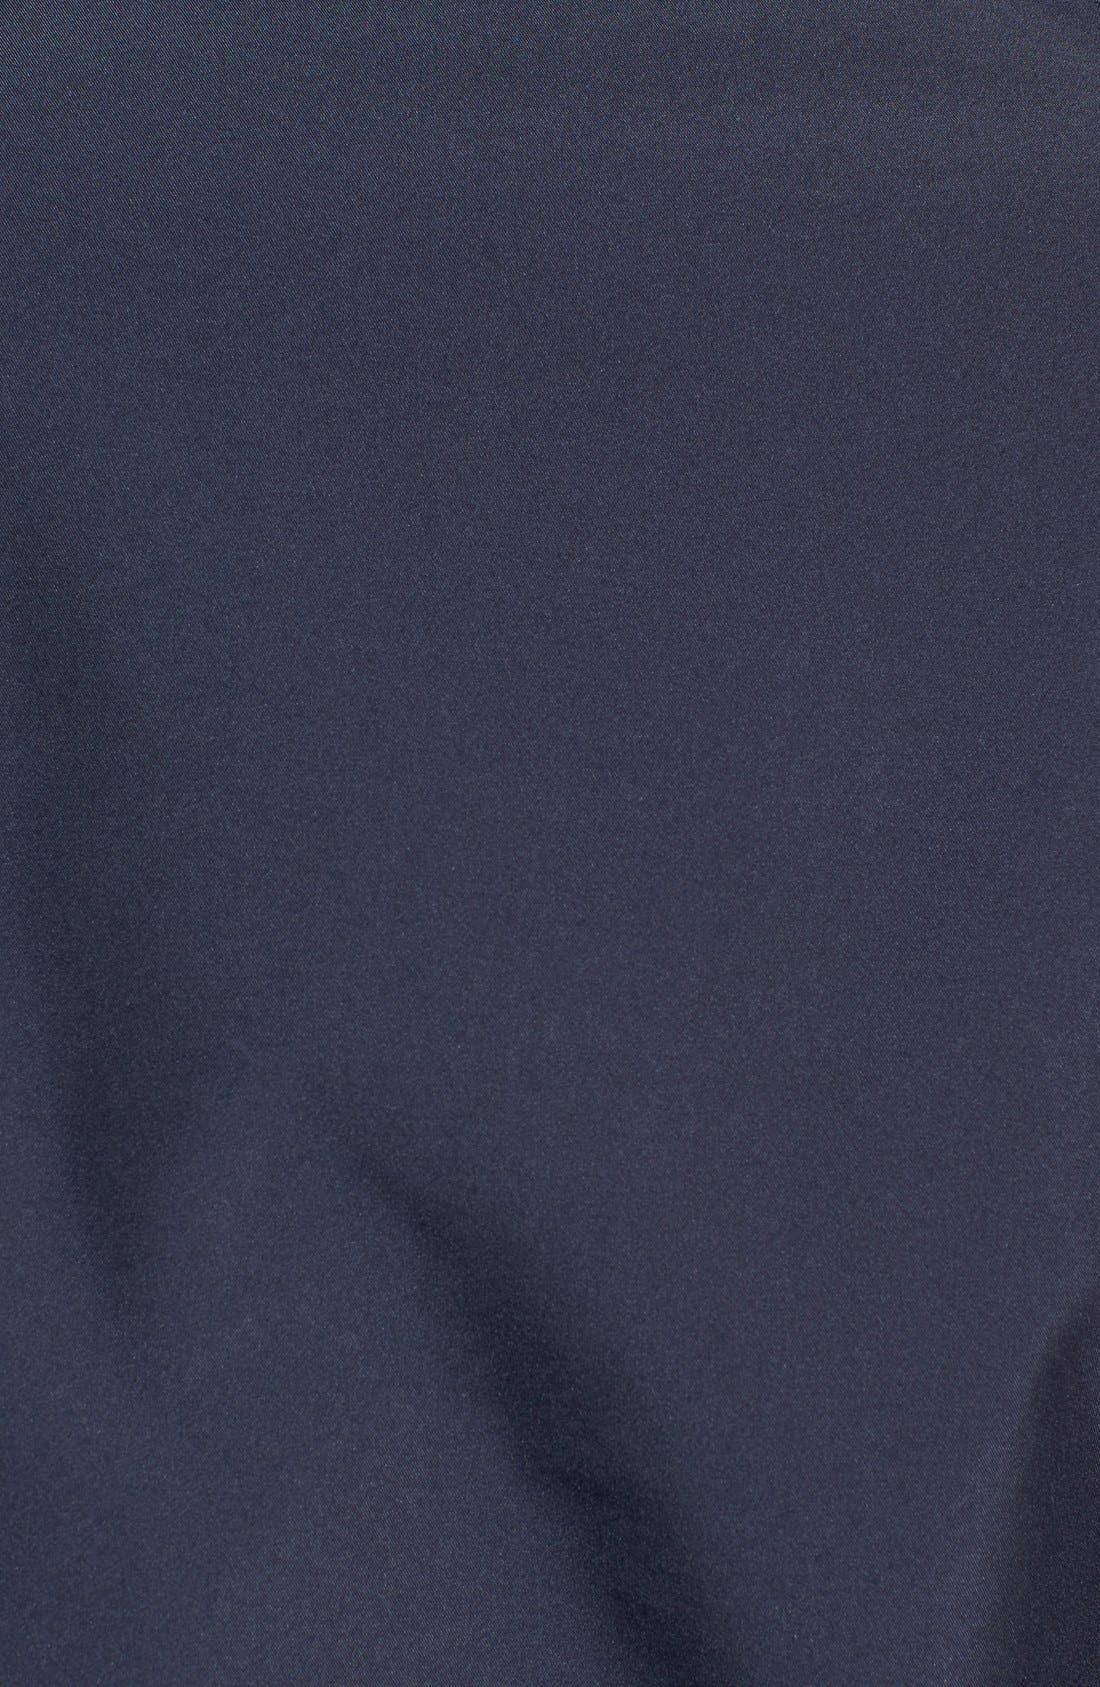 Denver Broncos - Beacon WeatherTec Wind & Water Resistant Jacket,                             Alternate thumbnail 3, color,                             Navy Blue